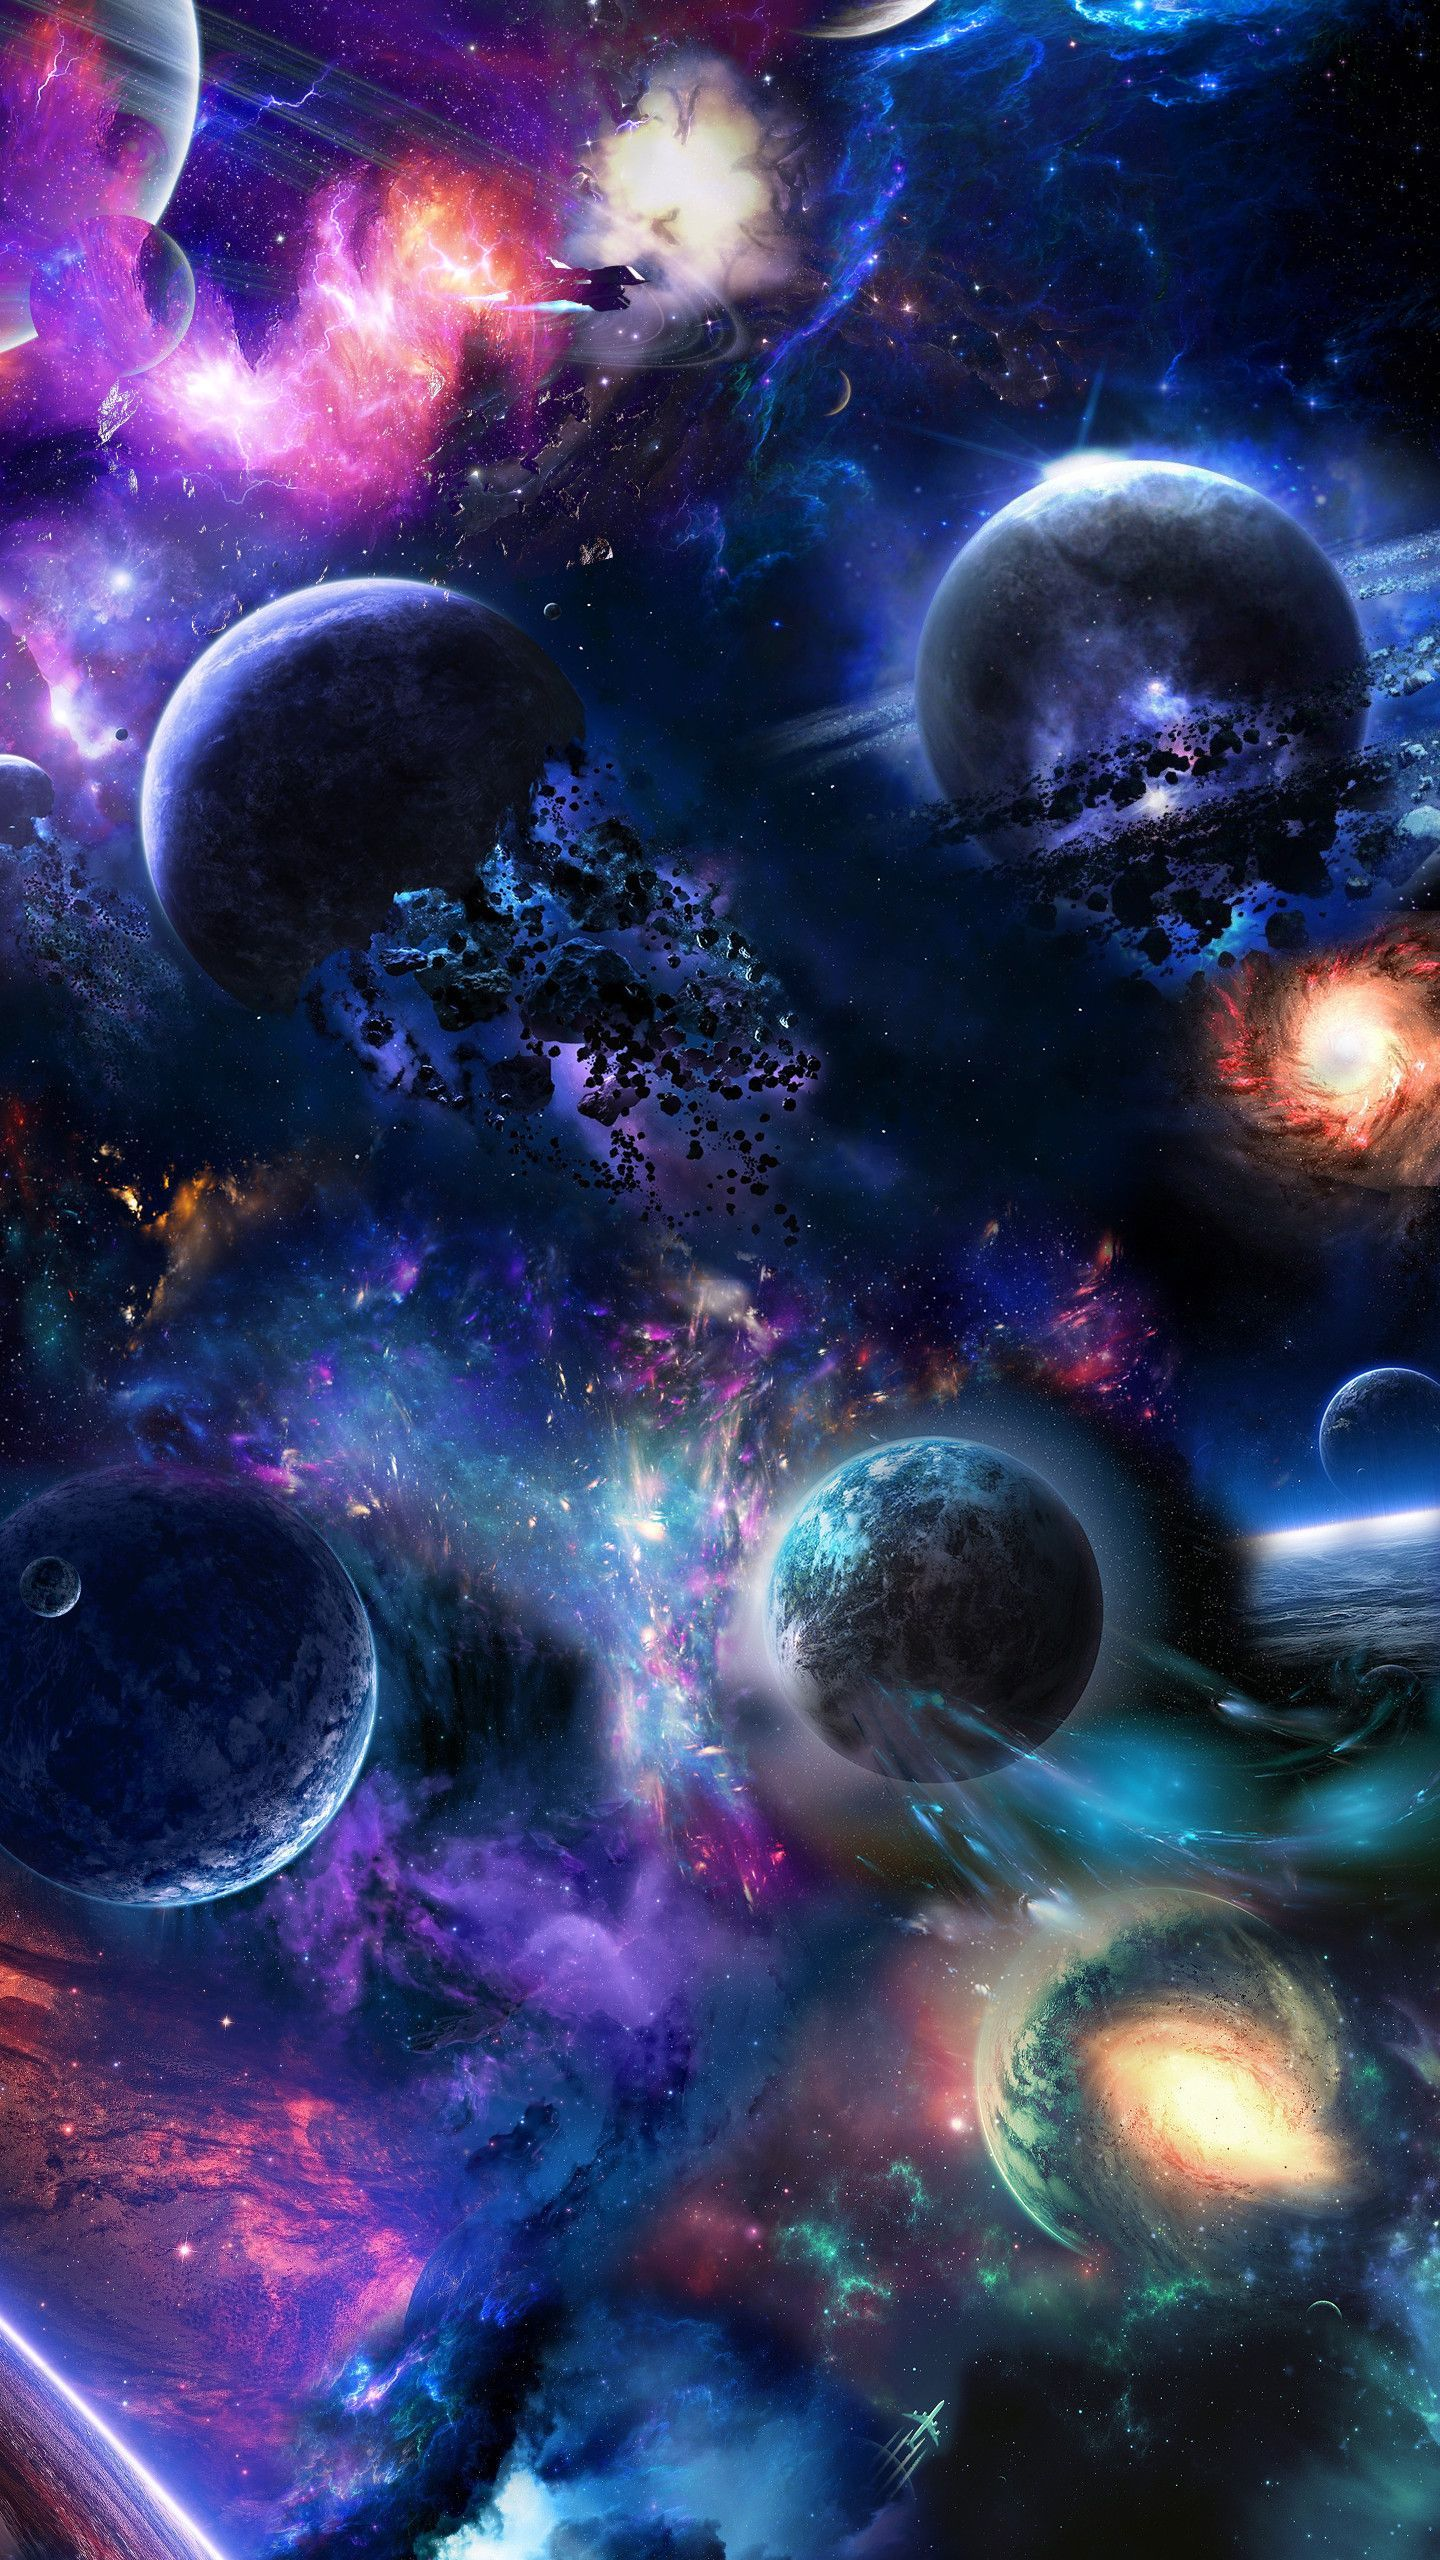 Space 4k Phone Wallpapers Top Free Space 4k Phone Backgrounds Wallpaperaccess V 2020 G Kartinki Galaktiki Oboi Galaktika Risunki Zhivotnyh